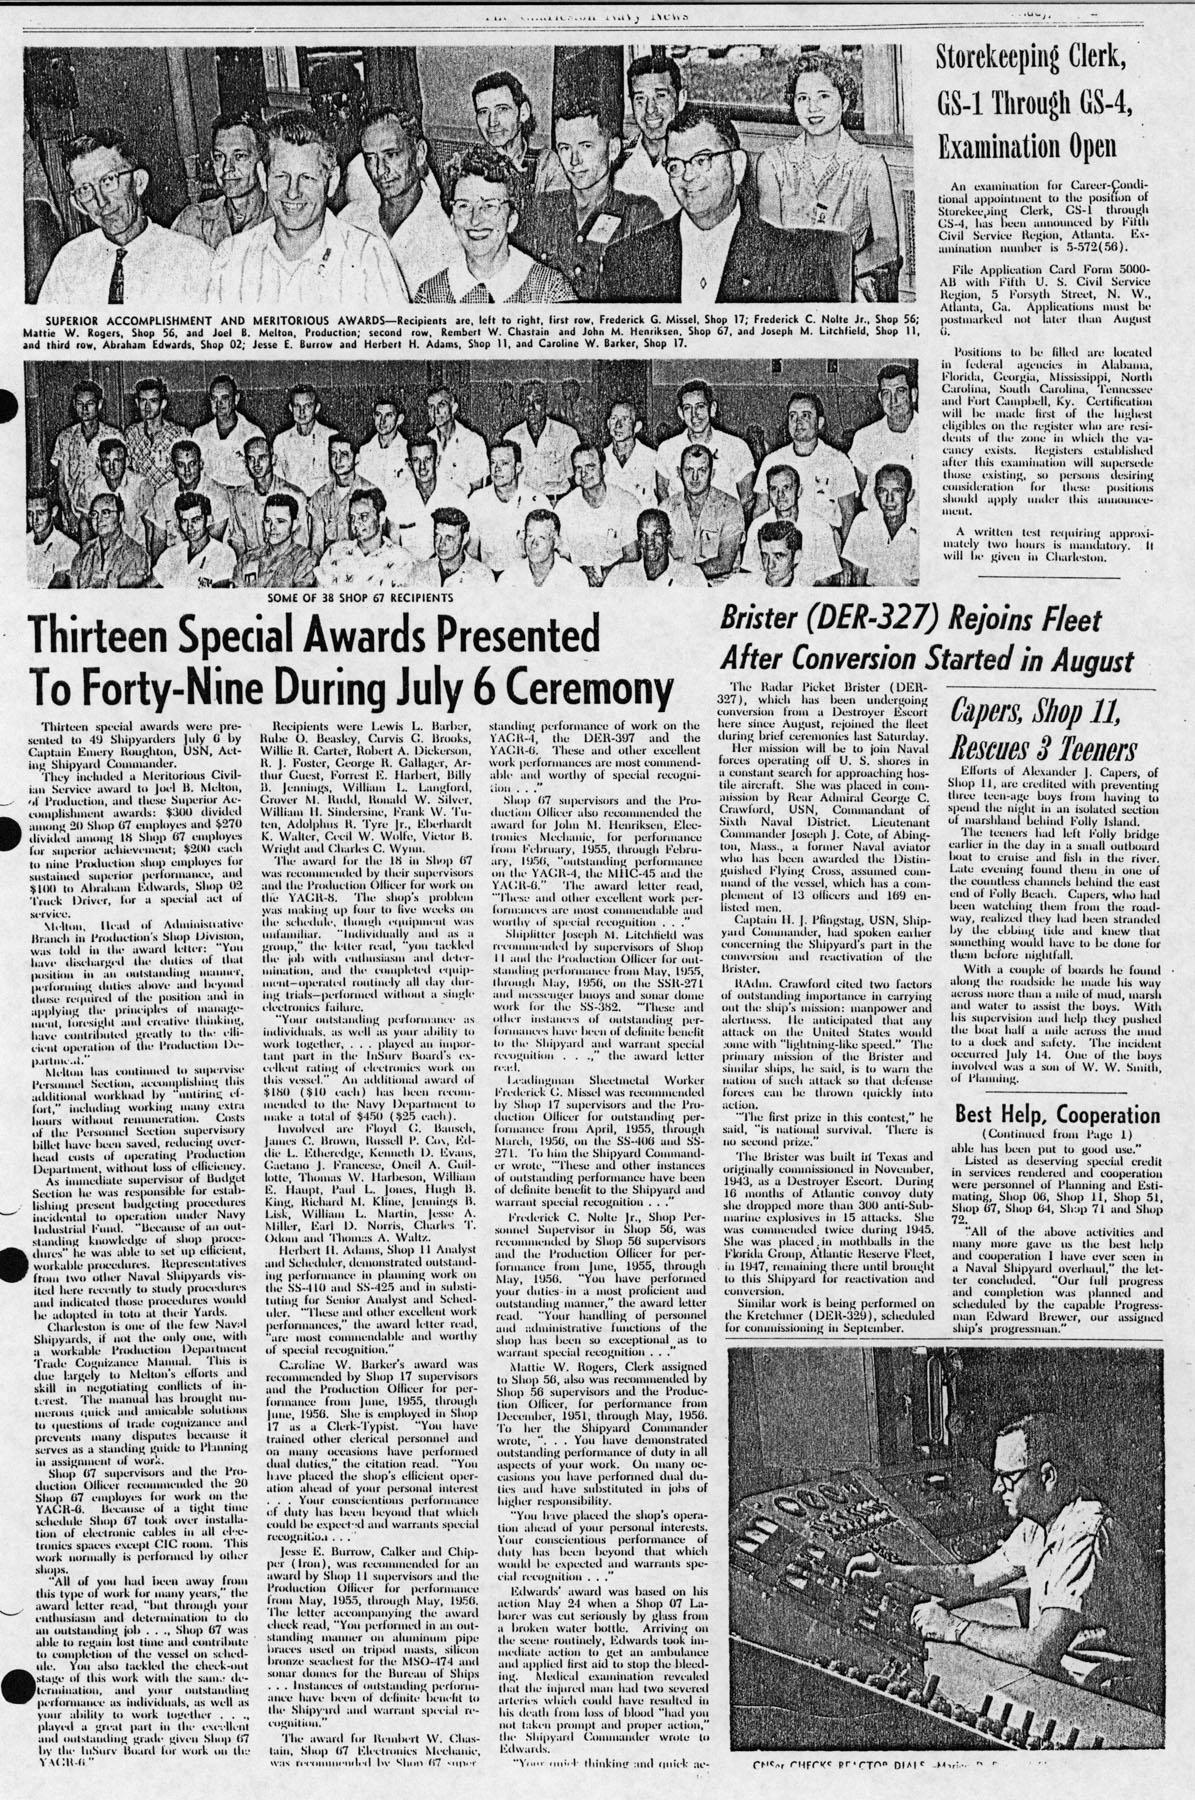 The Charleston Navy News, Volume 15, Edition 1, page iv